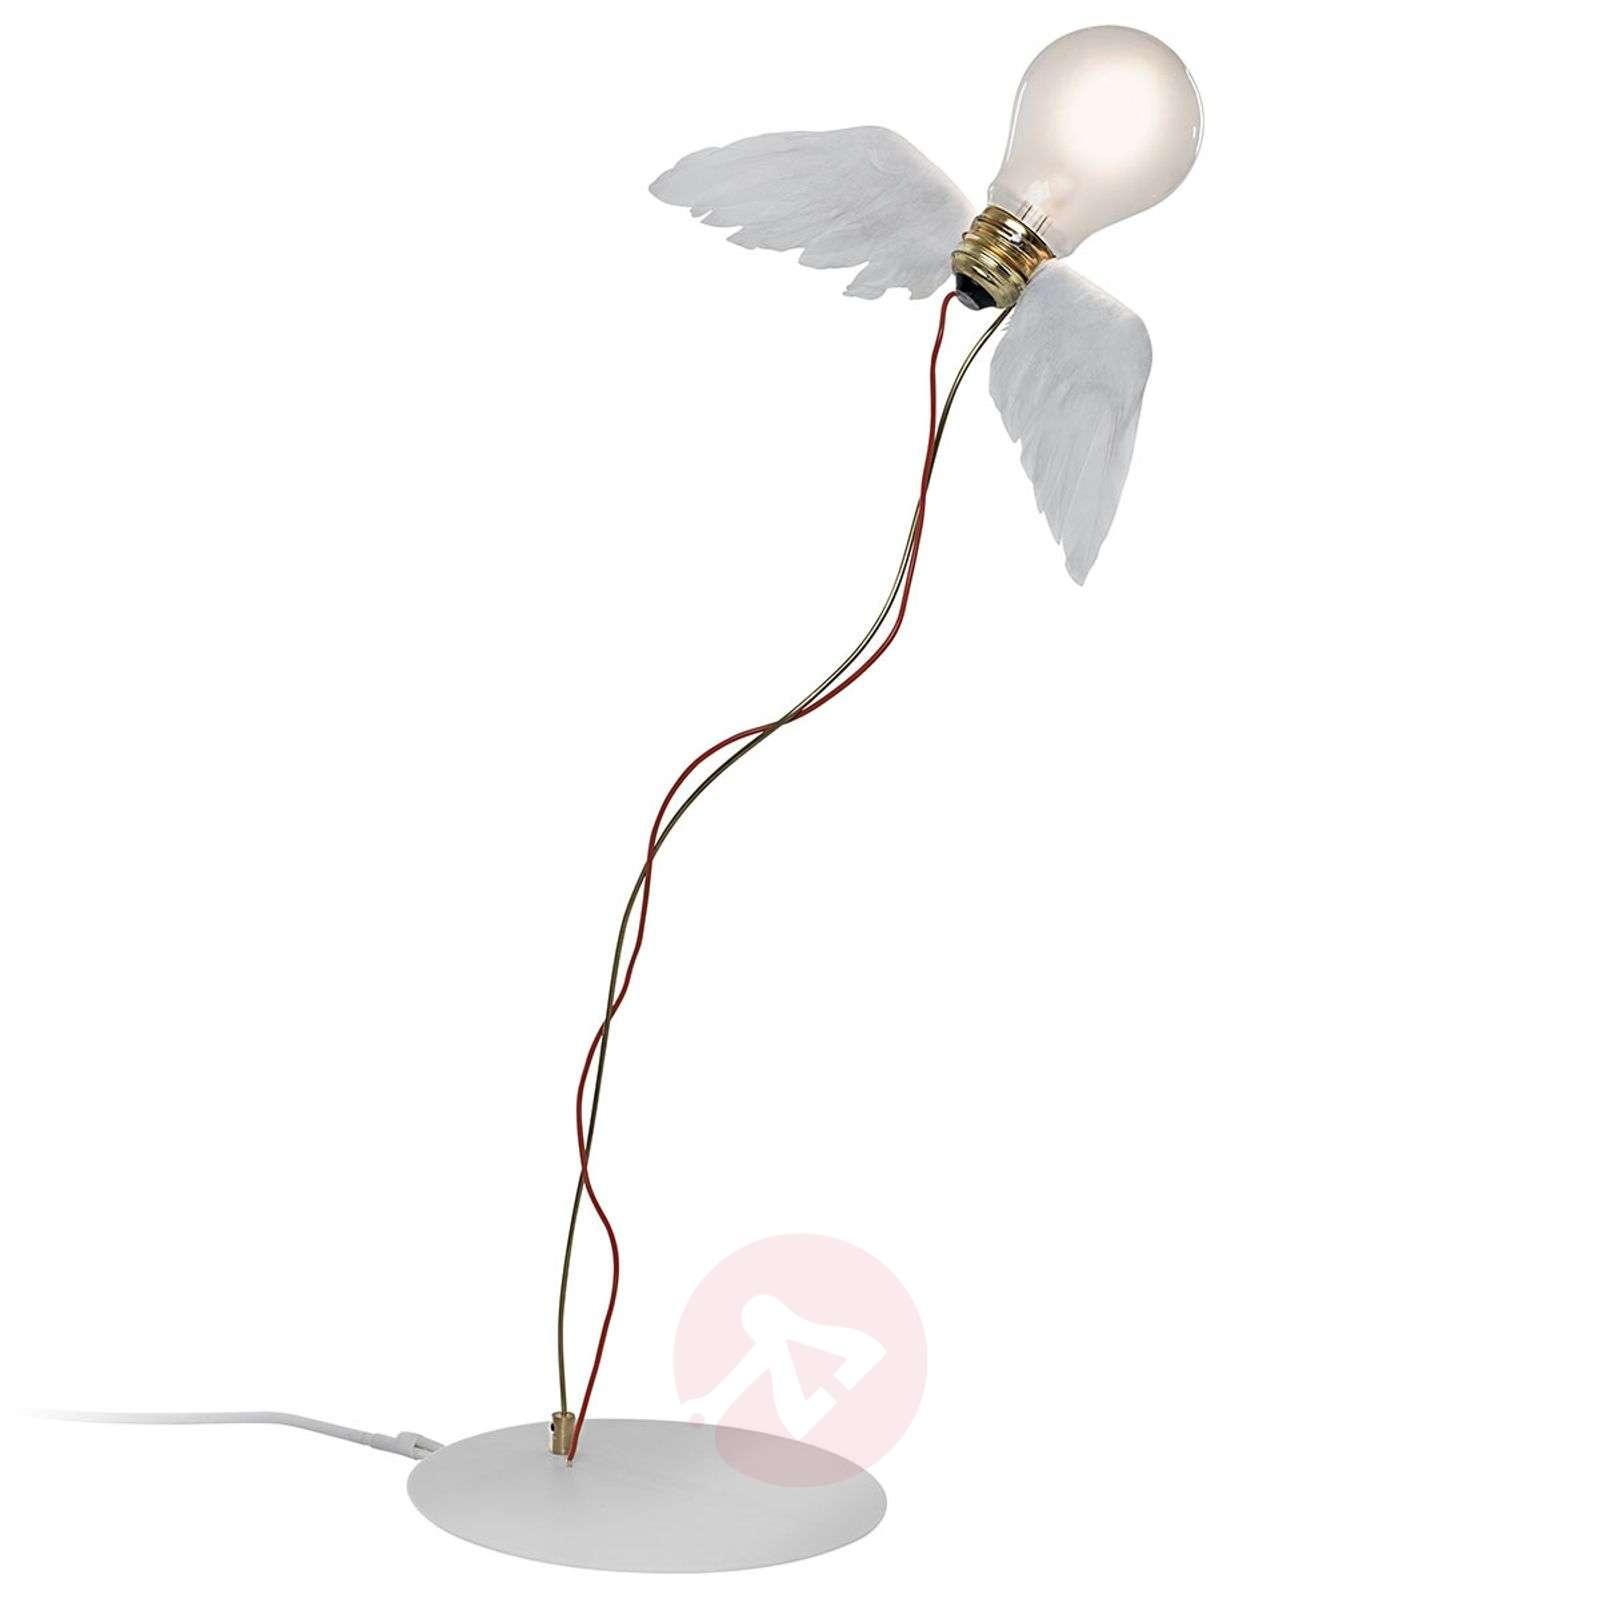 Winged LED designer table lamp Lucellino LED-5026101-01